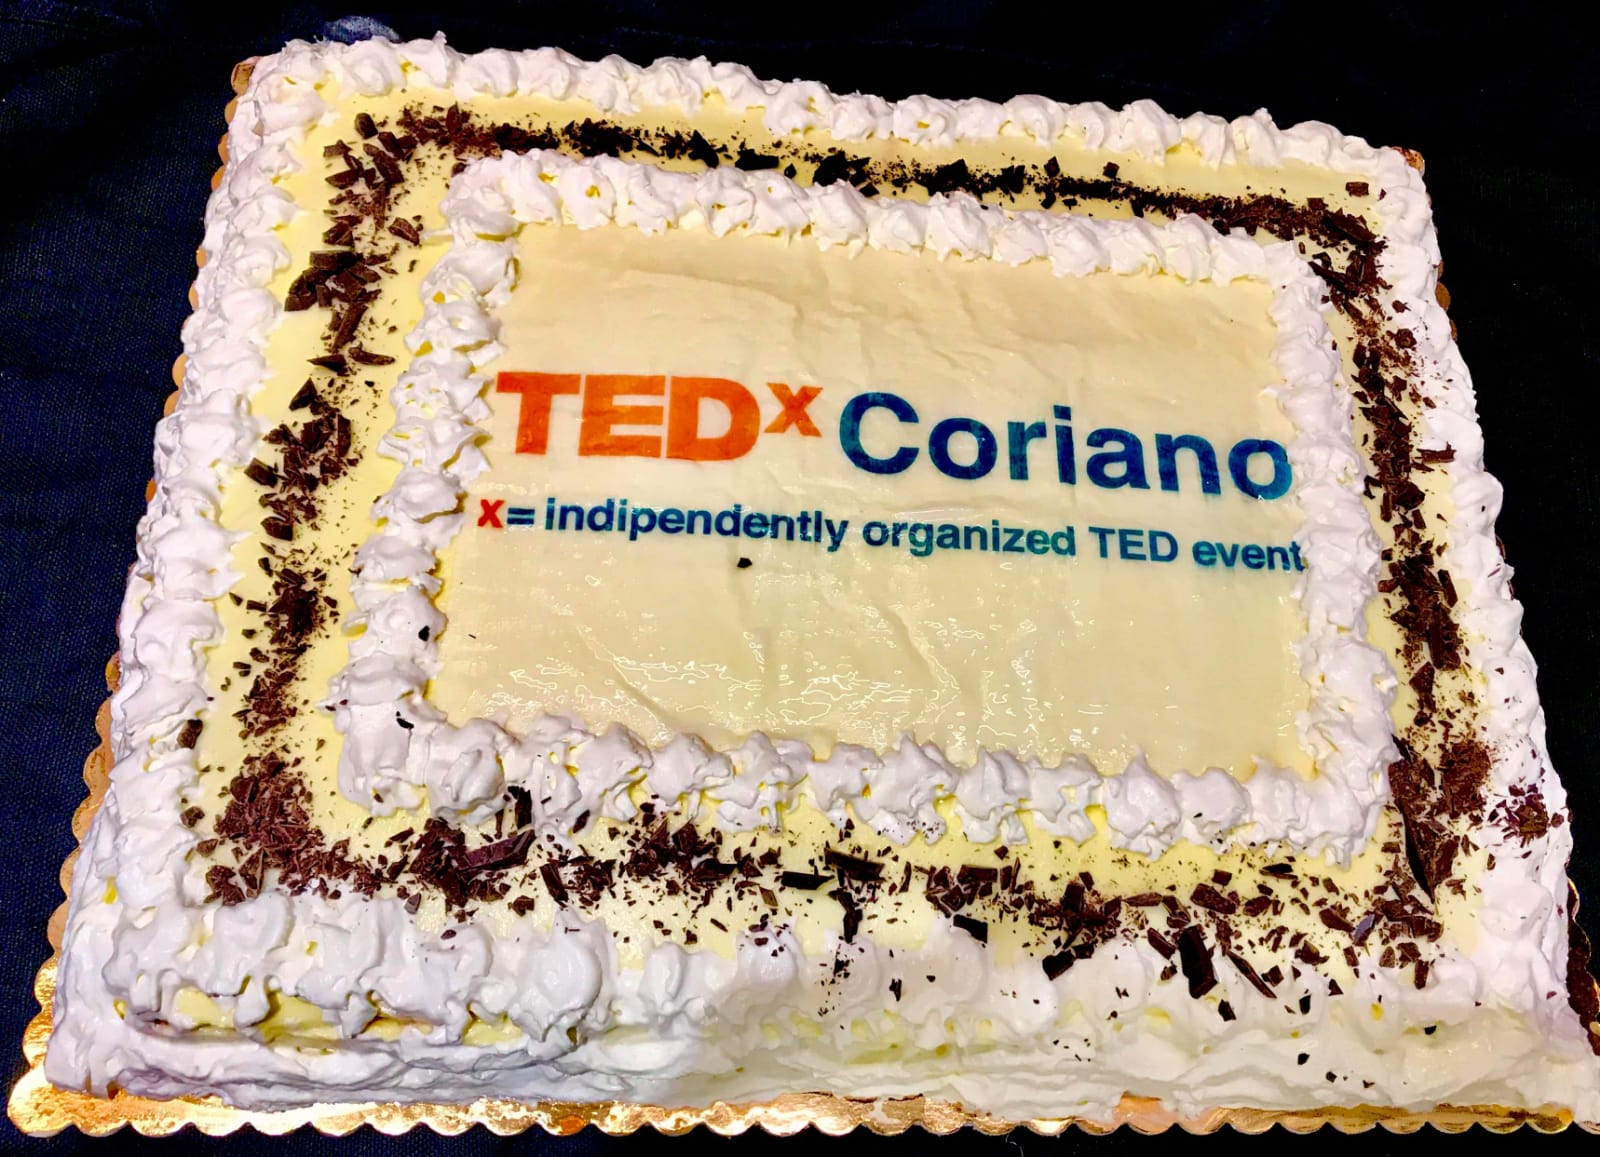 TedX-Coriano-torta - comunicarete spnsor evento torta